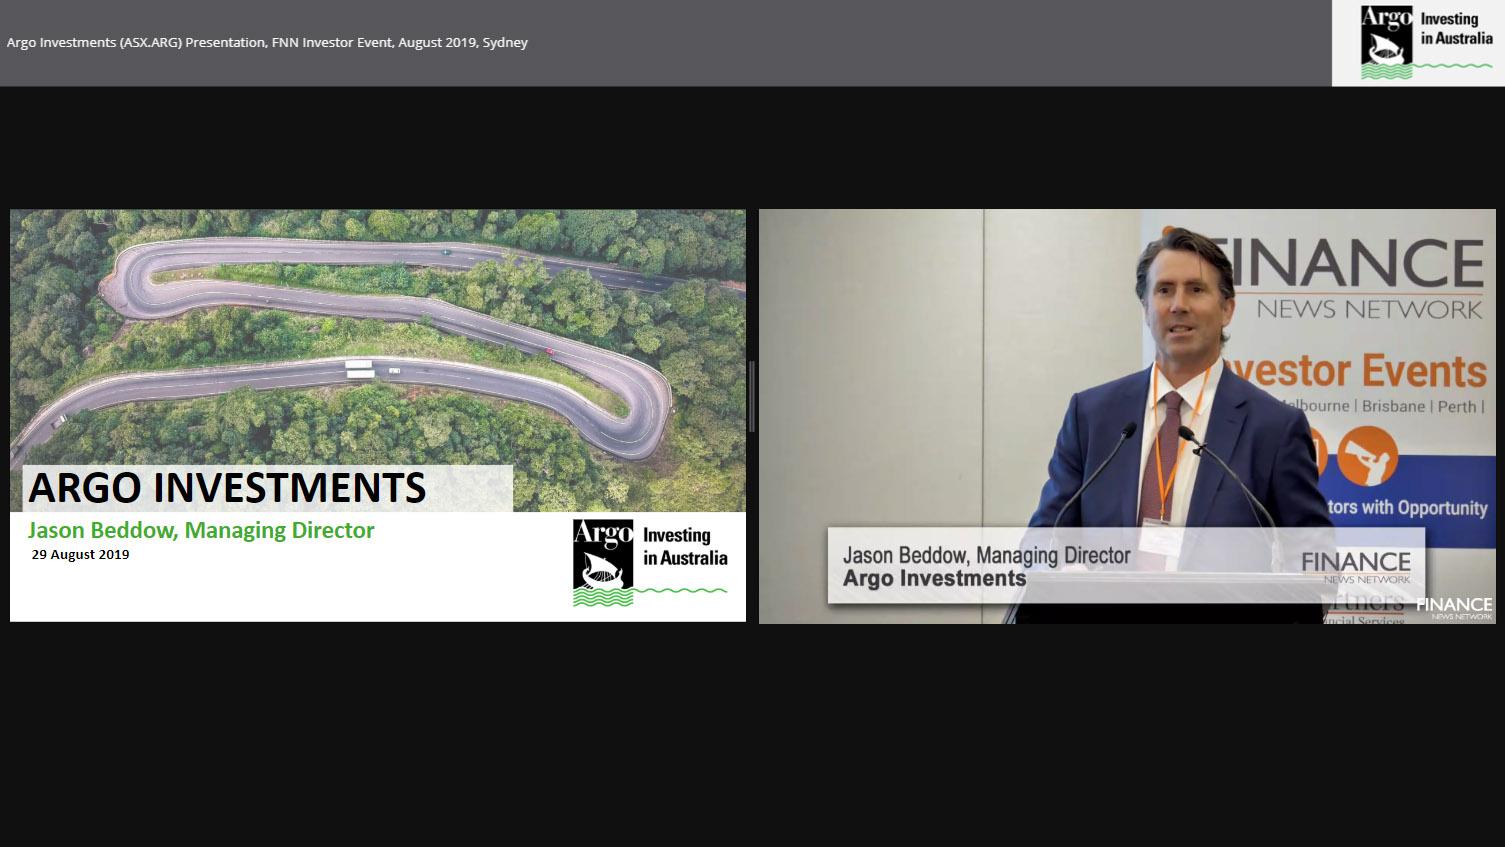 Argo Investments Limited (ASX:ARG) Presentation, FNN